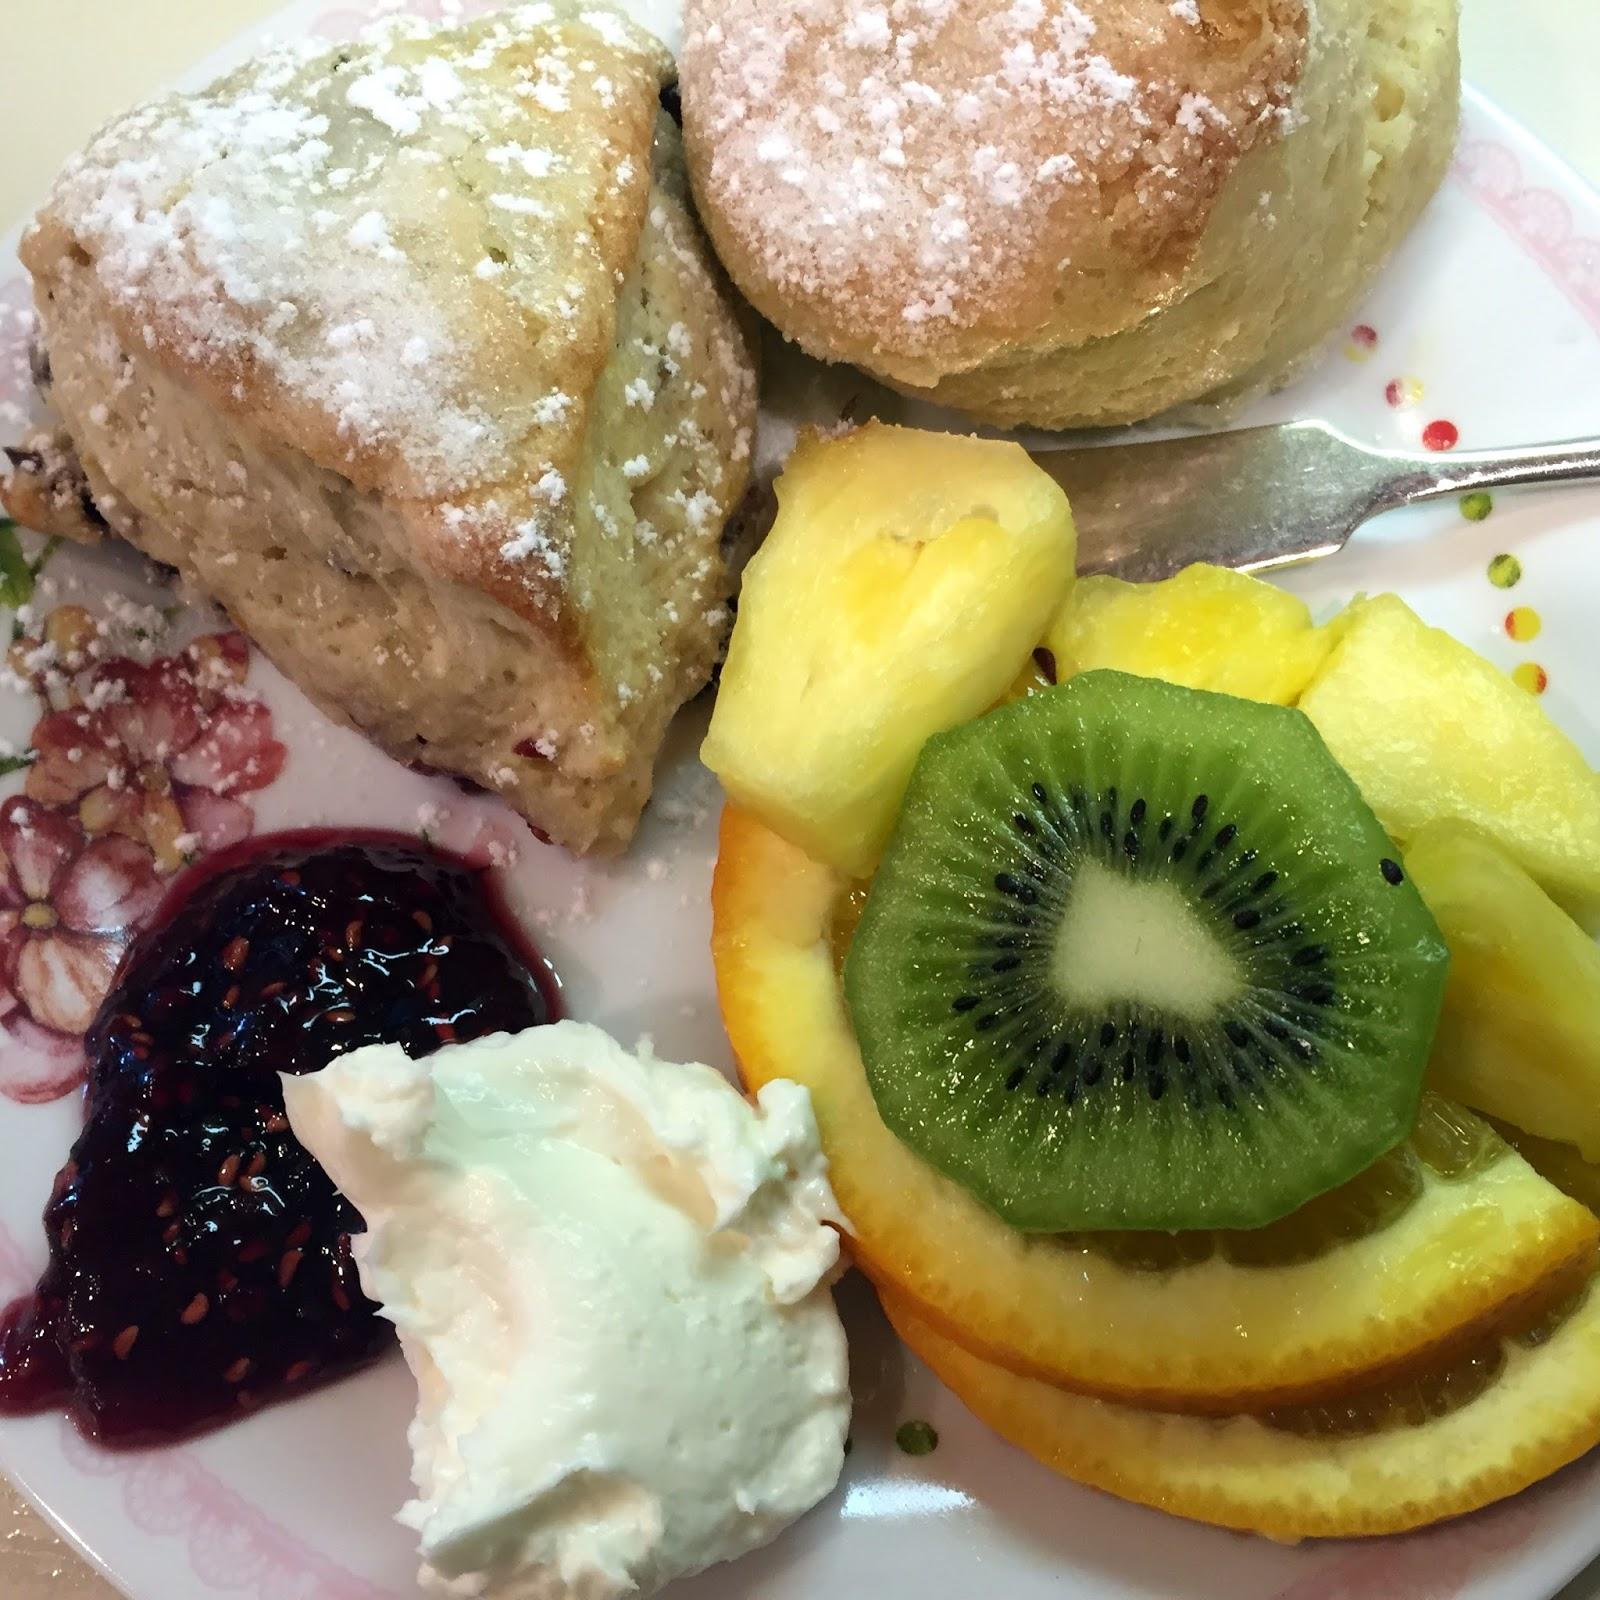 Rosemary 39 s sampler the royal tea club visit for Club sandwich fillings for high tea